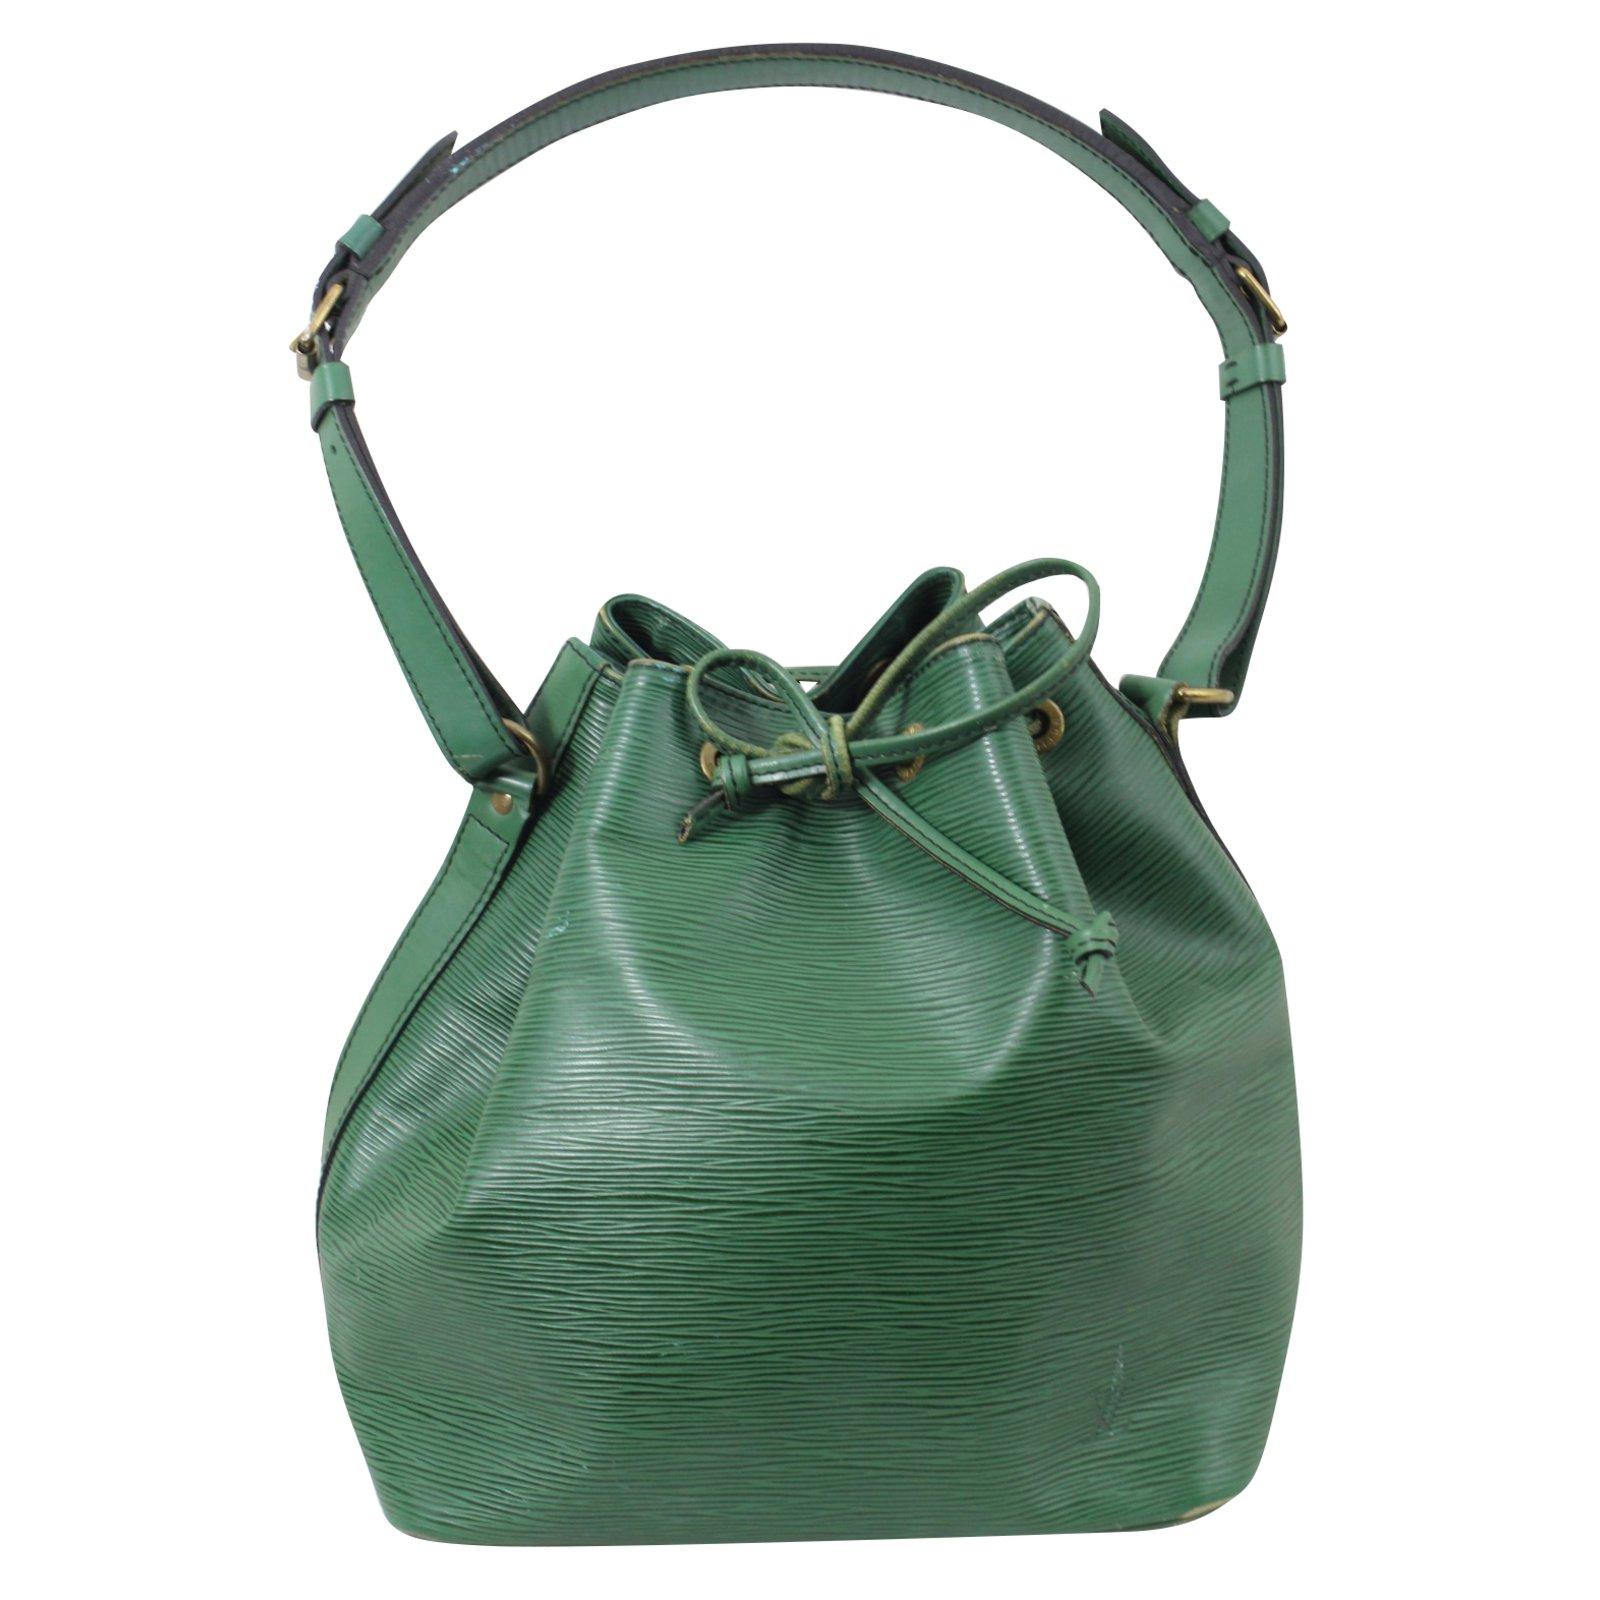 a4652c5e76b8 Louis Vuitton Noe Epi Handbags Leather Green ref.51948 - Joli Closet